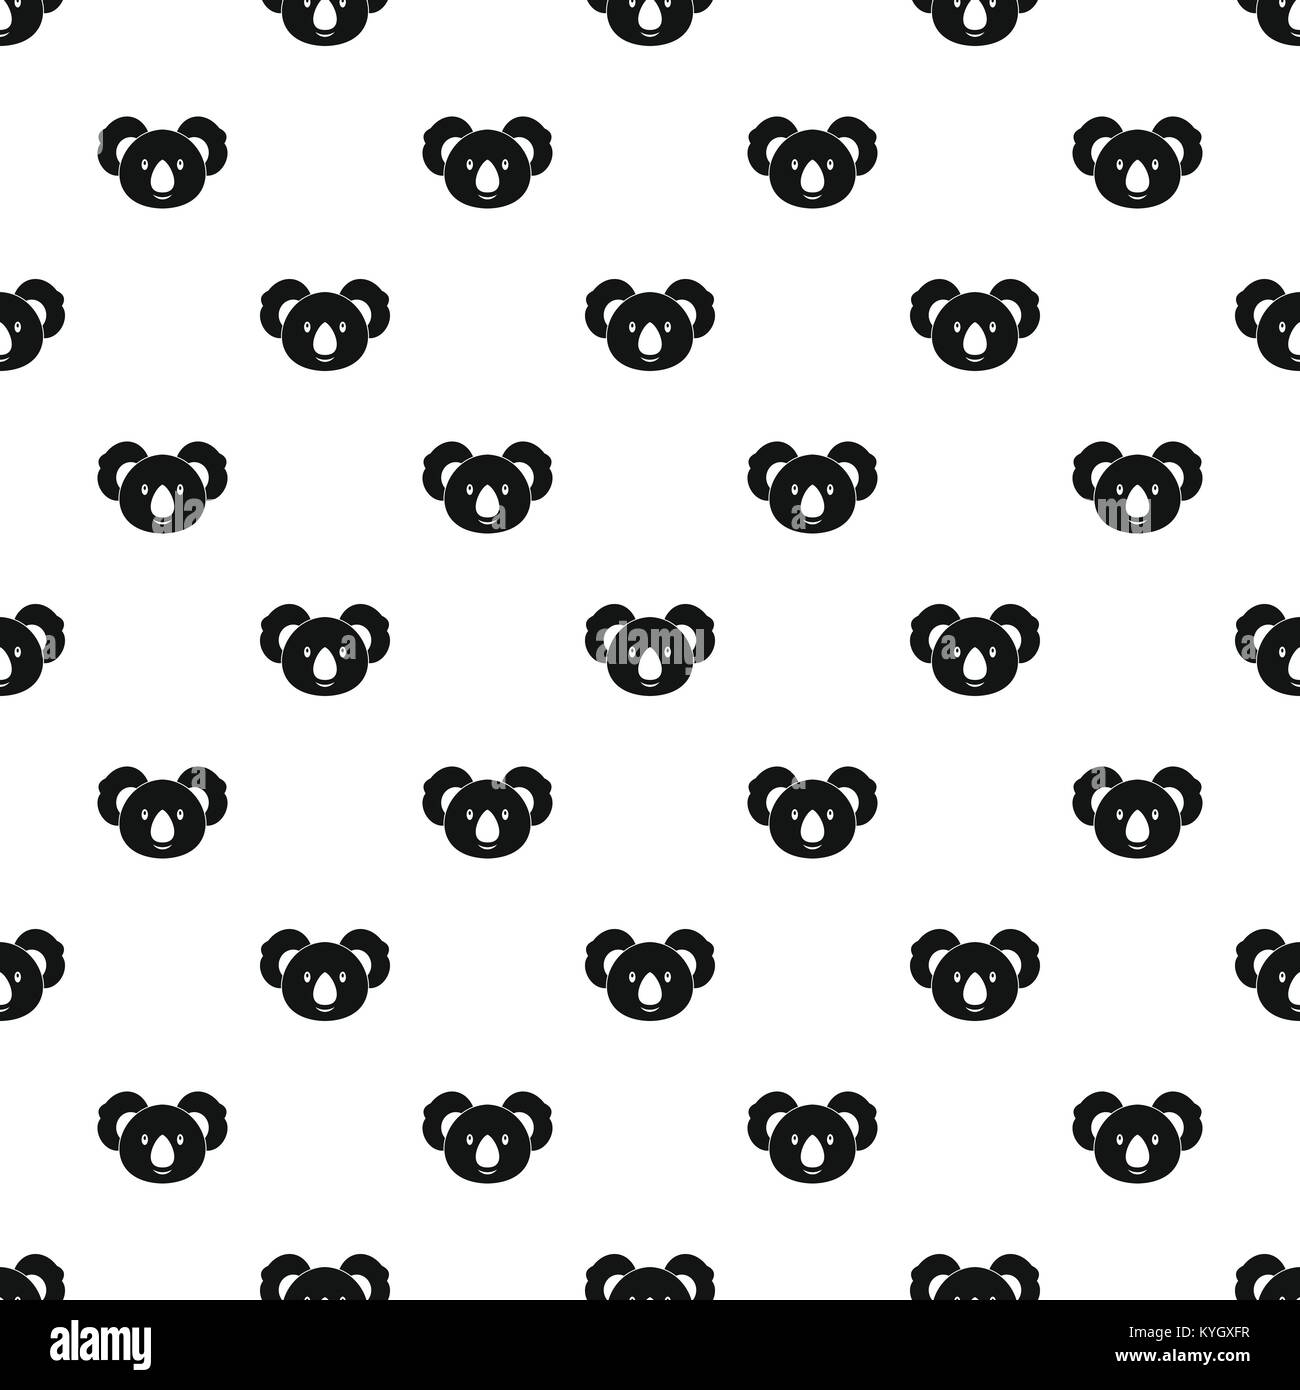 Koala pattern vector - Stock Image